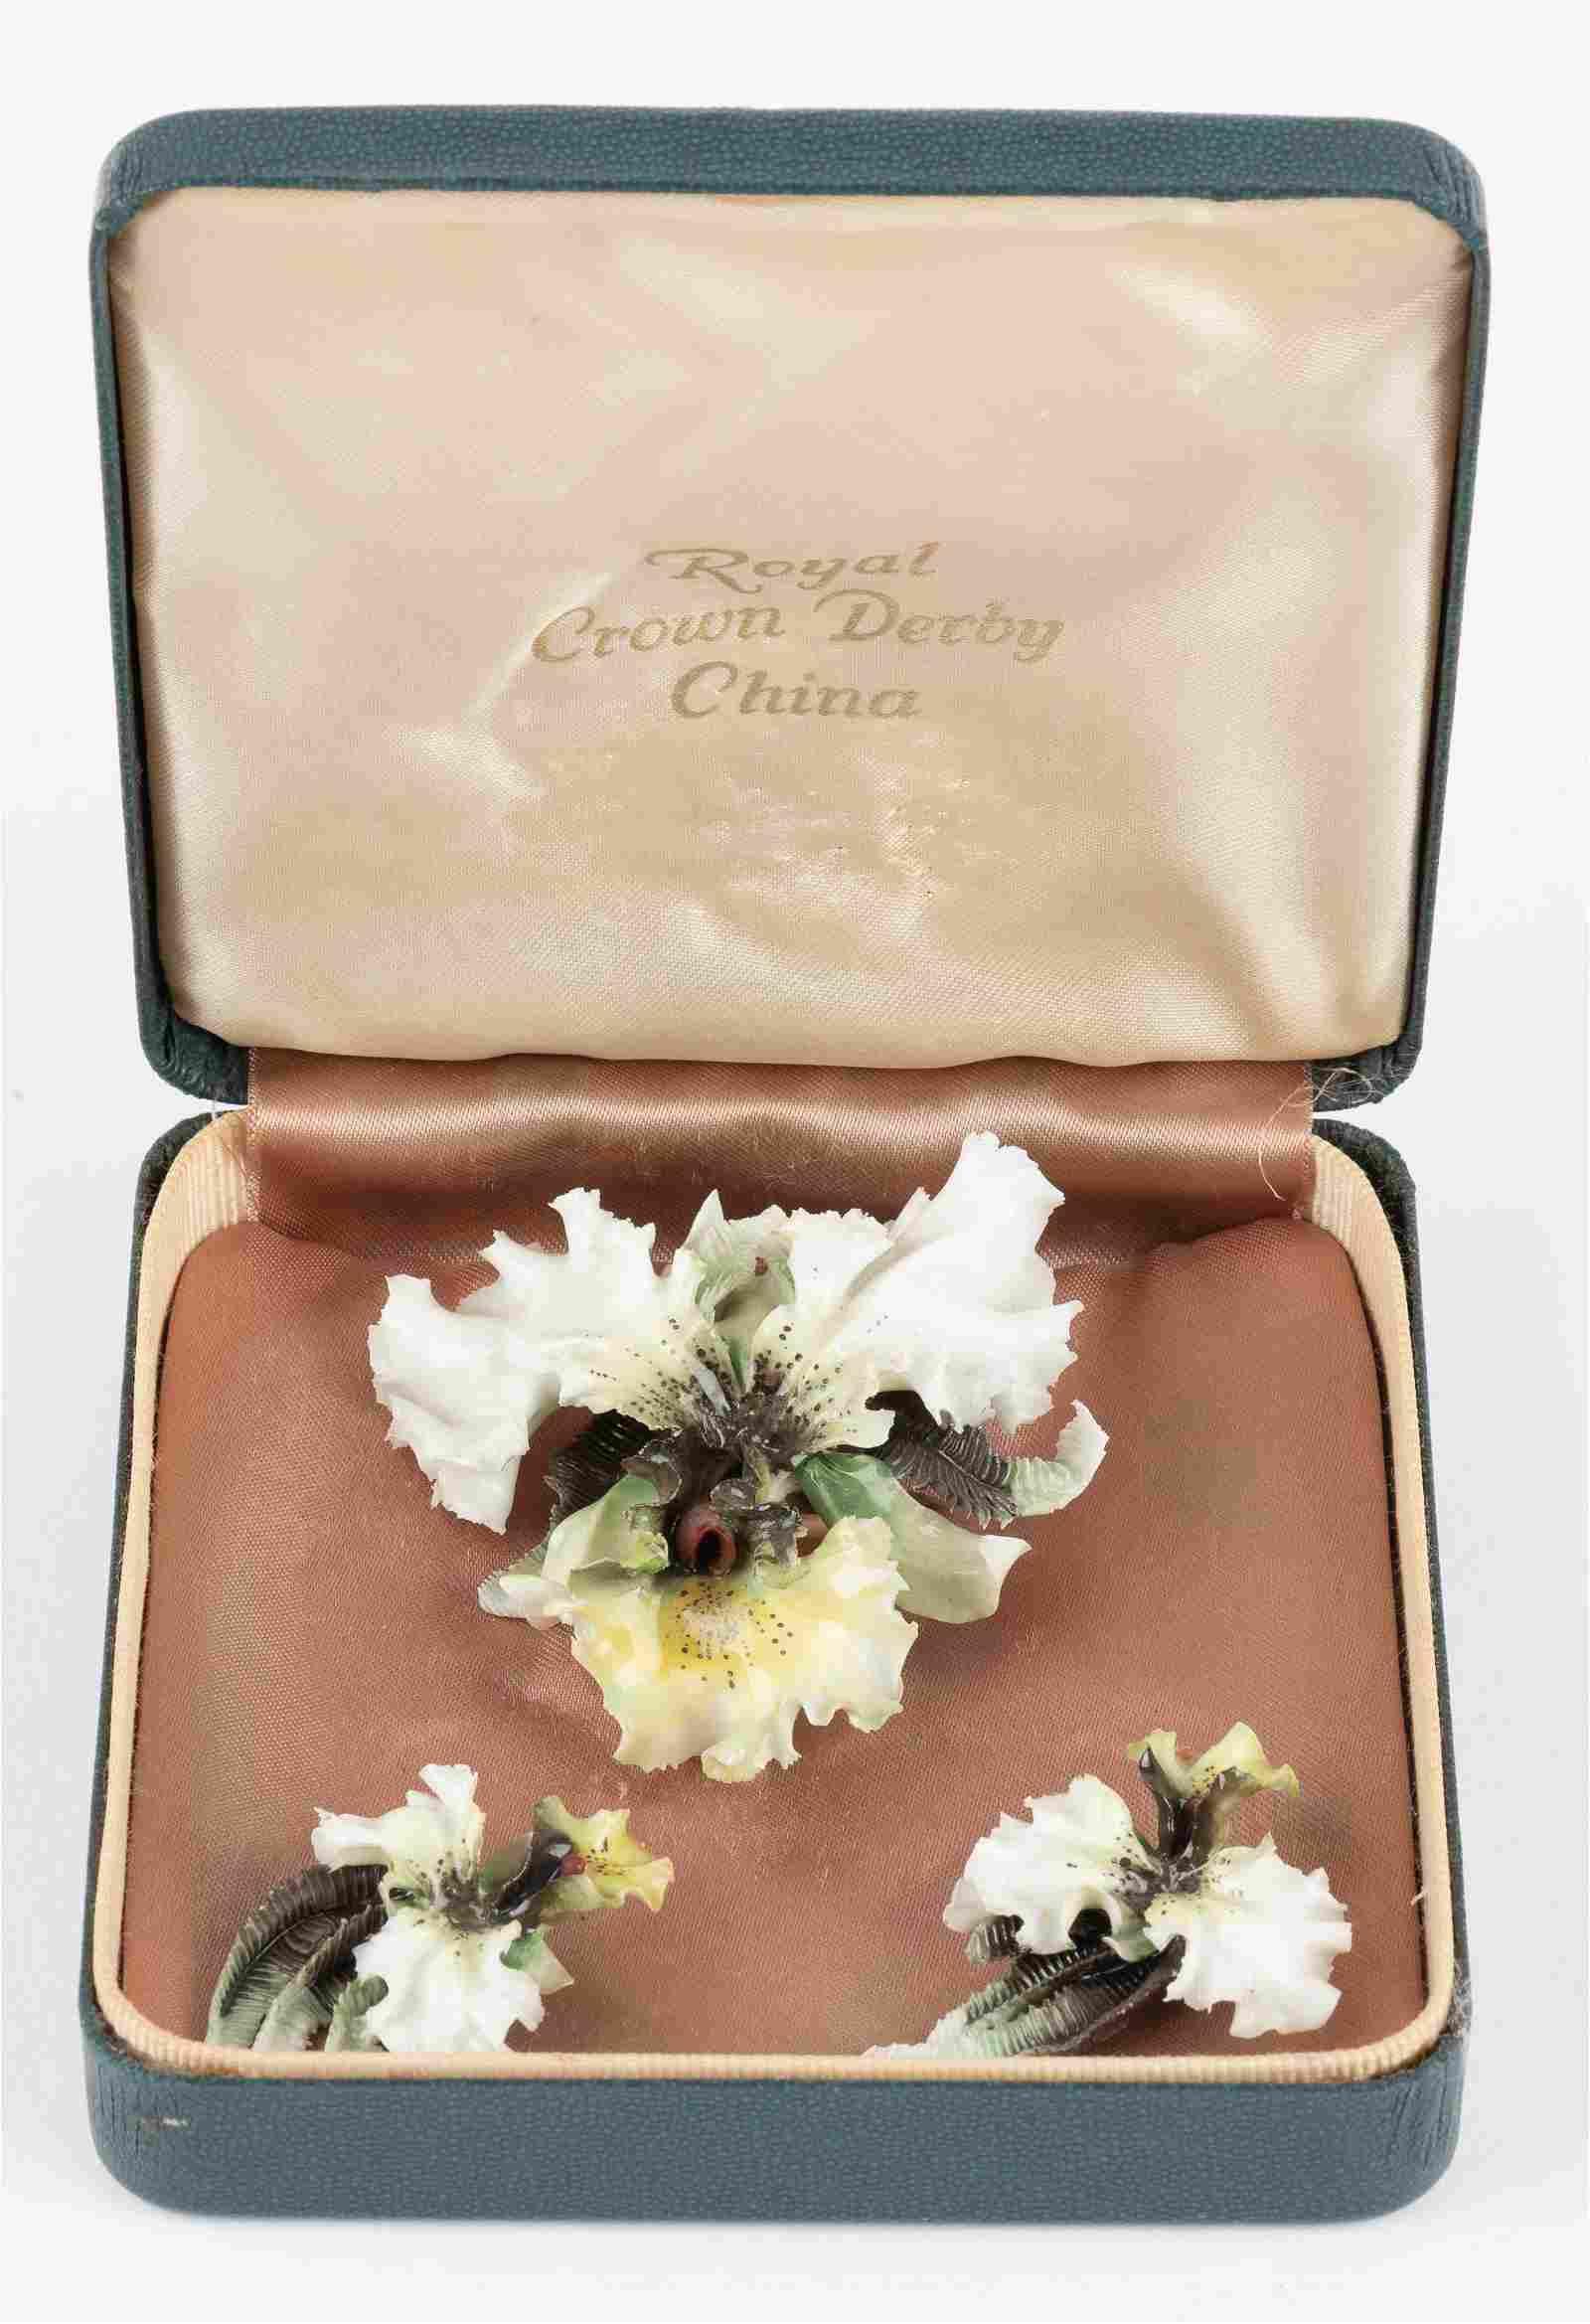 Royal Crown Derby Jewelry Set